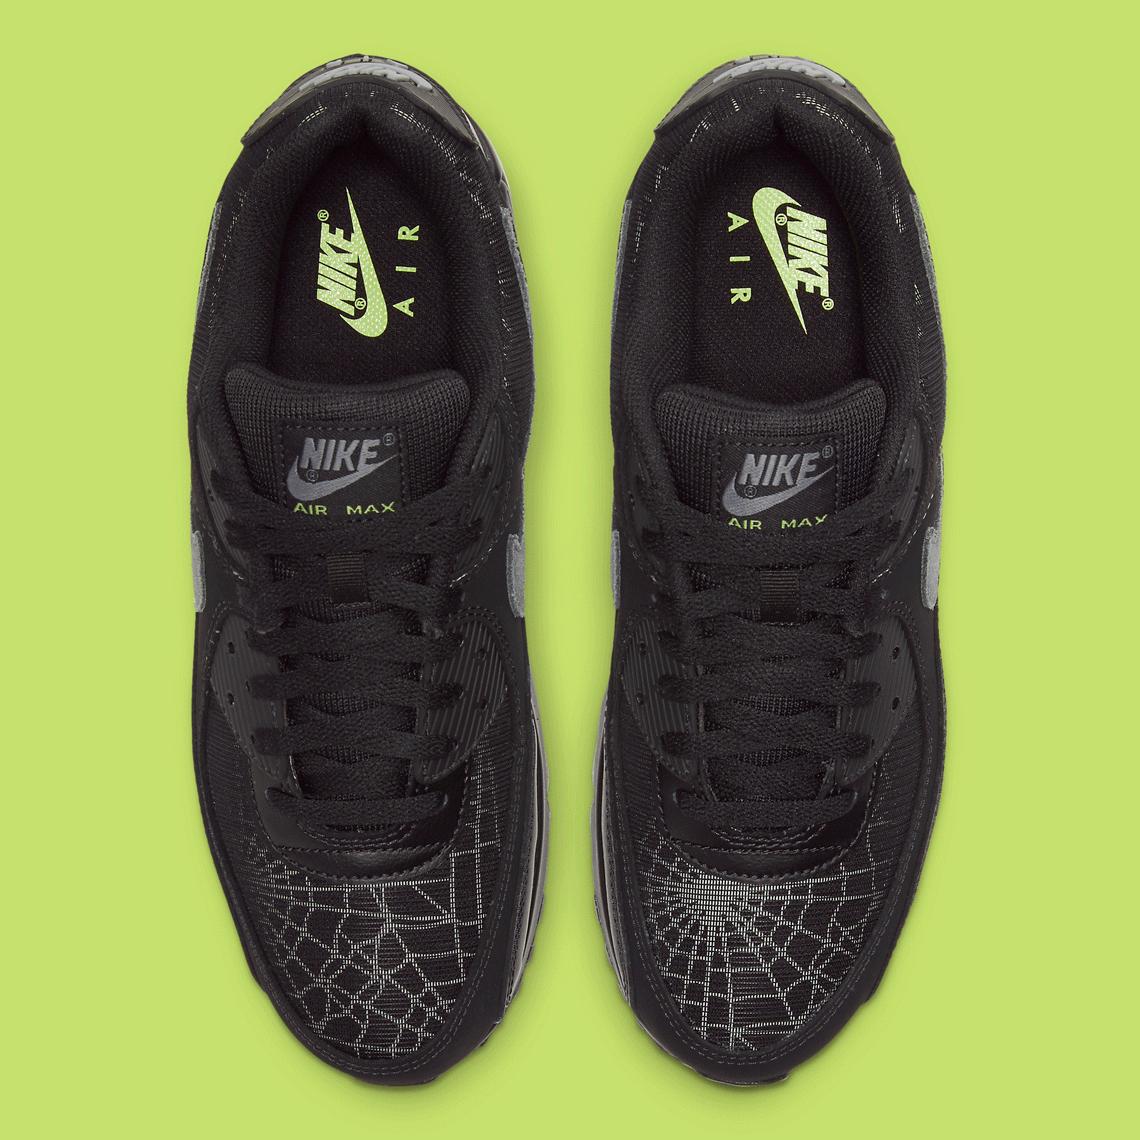 Black Friday Halloween Deals 2020 Halloween Nike Air Max 90 DC3892 001 Release Info | SneakerNews.com